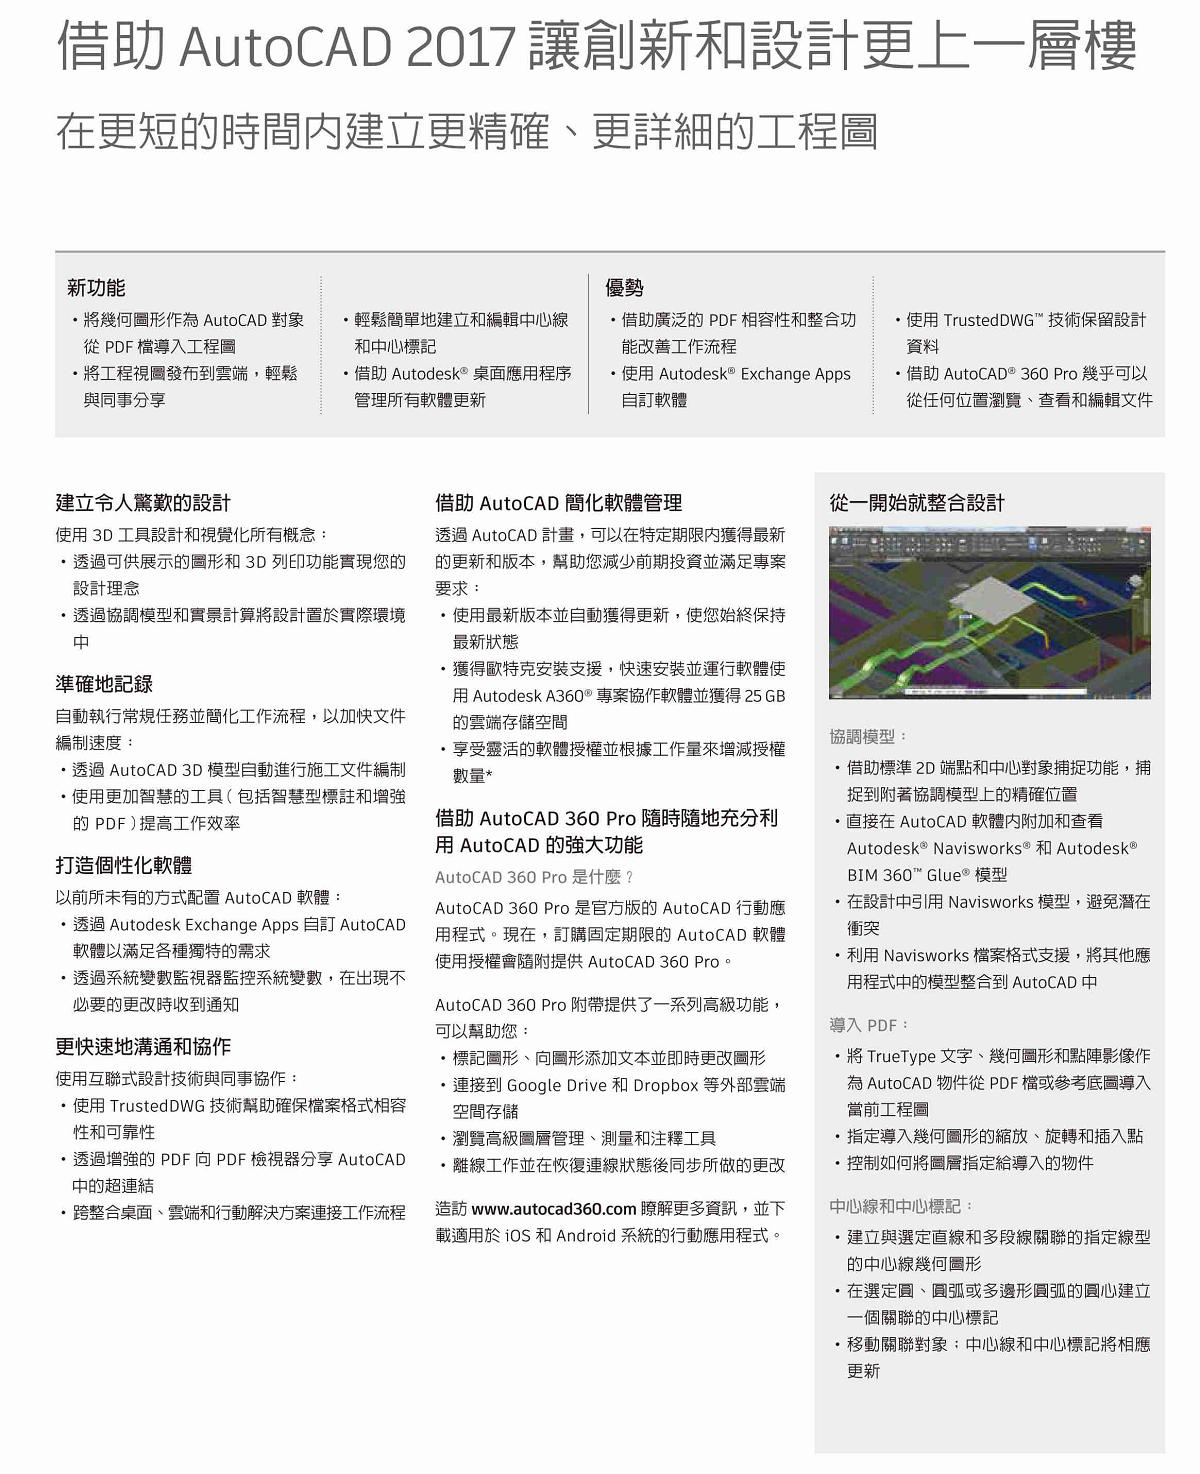 autocad-2017-brochure_tc_2-4-techez-1200